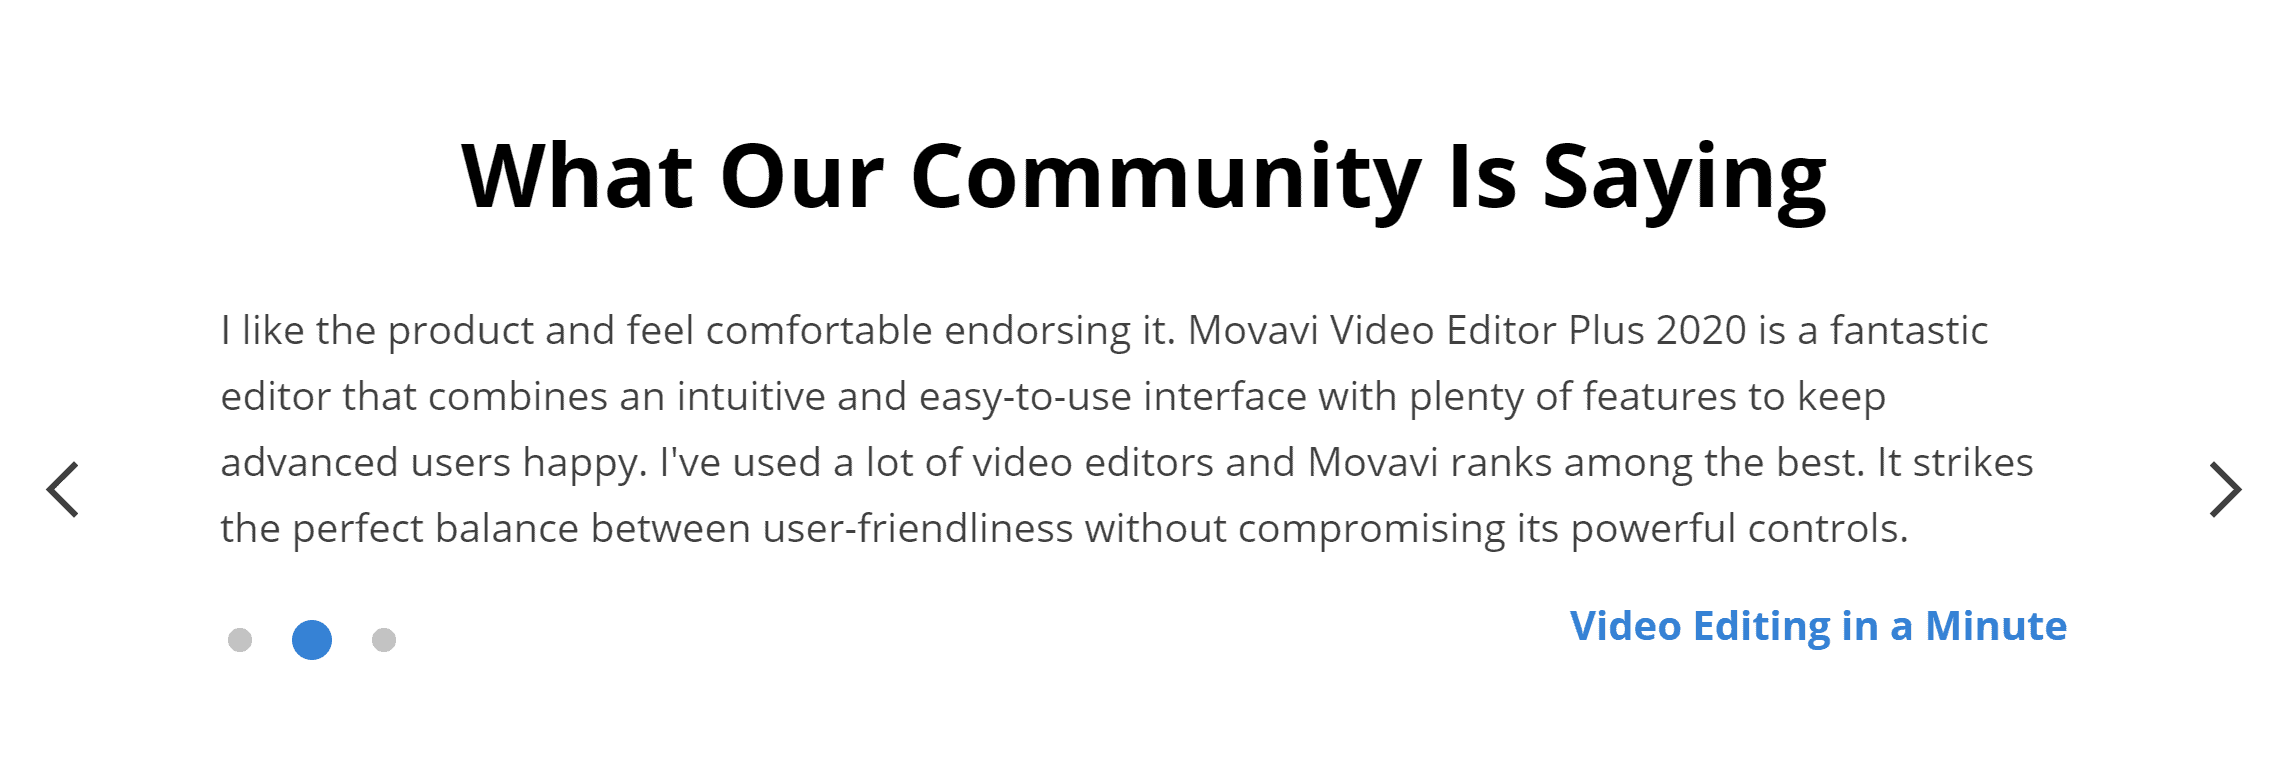 Movavi reviews and testimonials